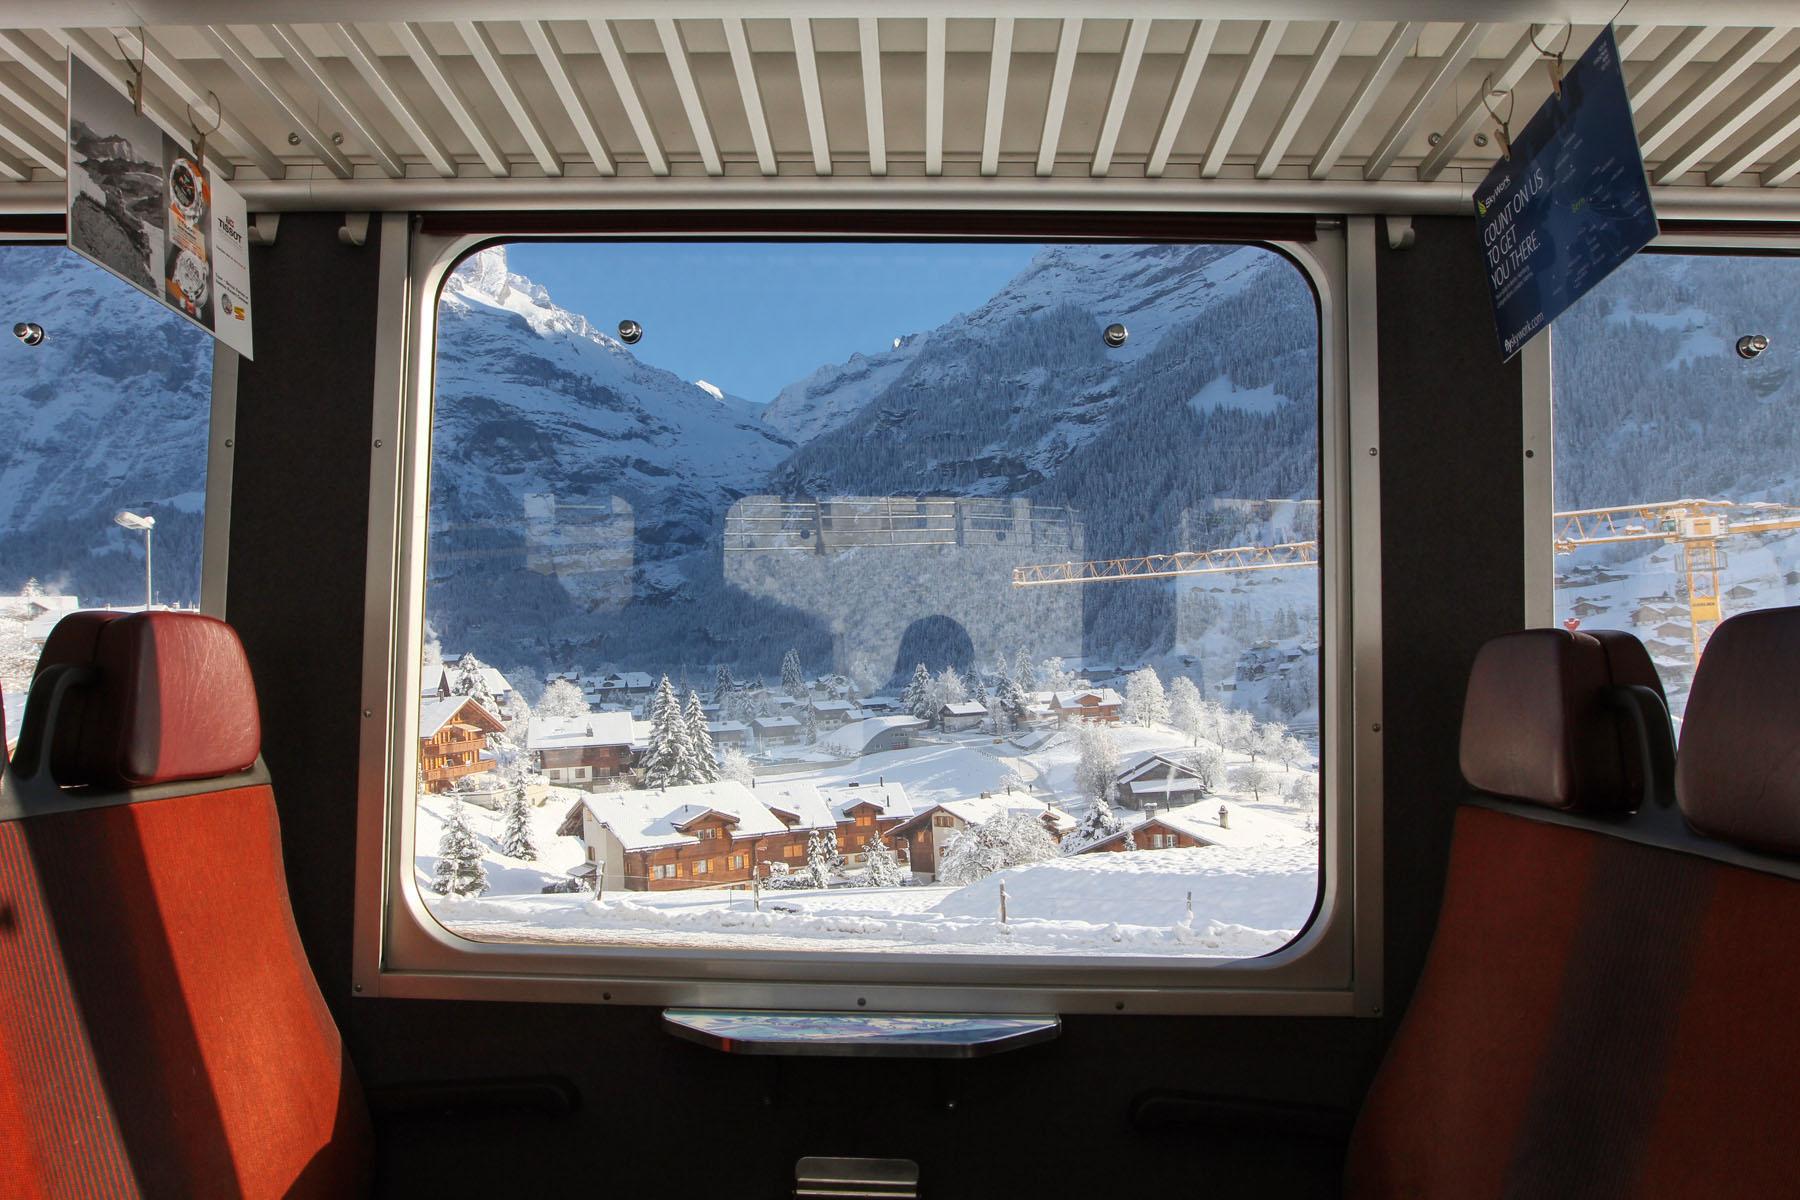 Switzerland-St. Moritz_134462249